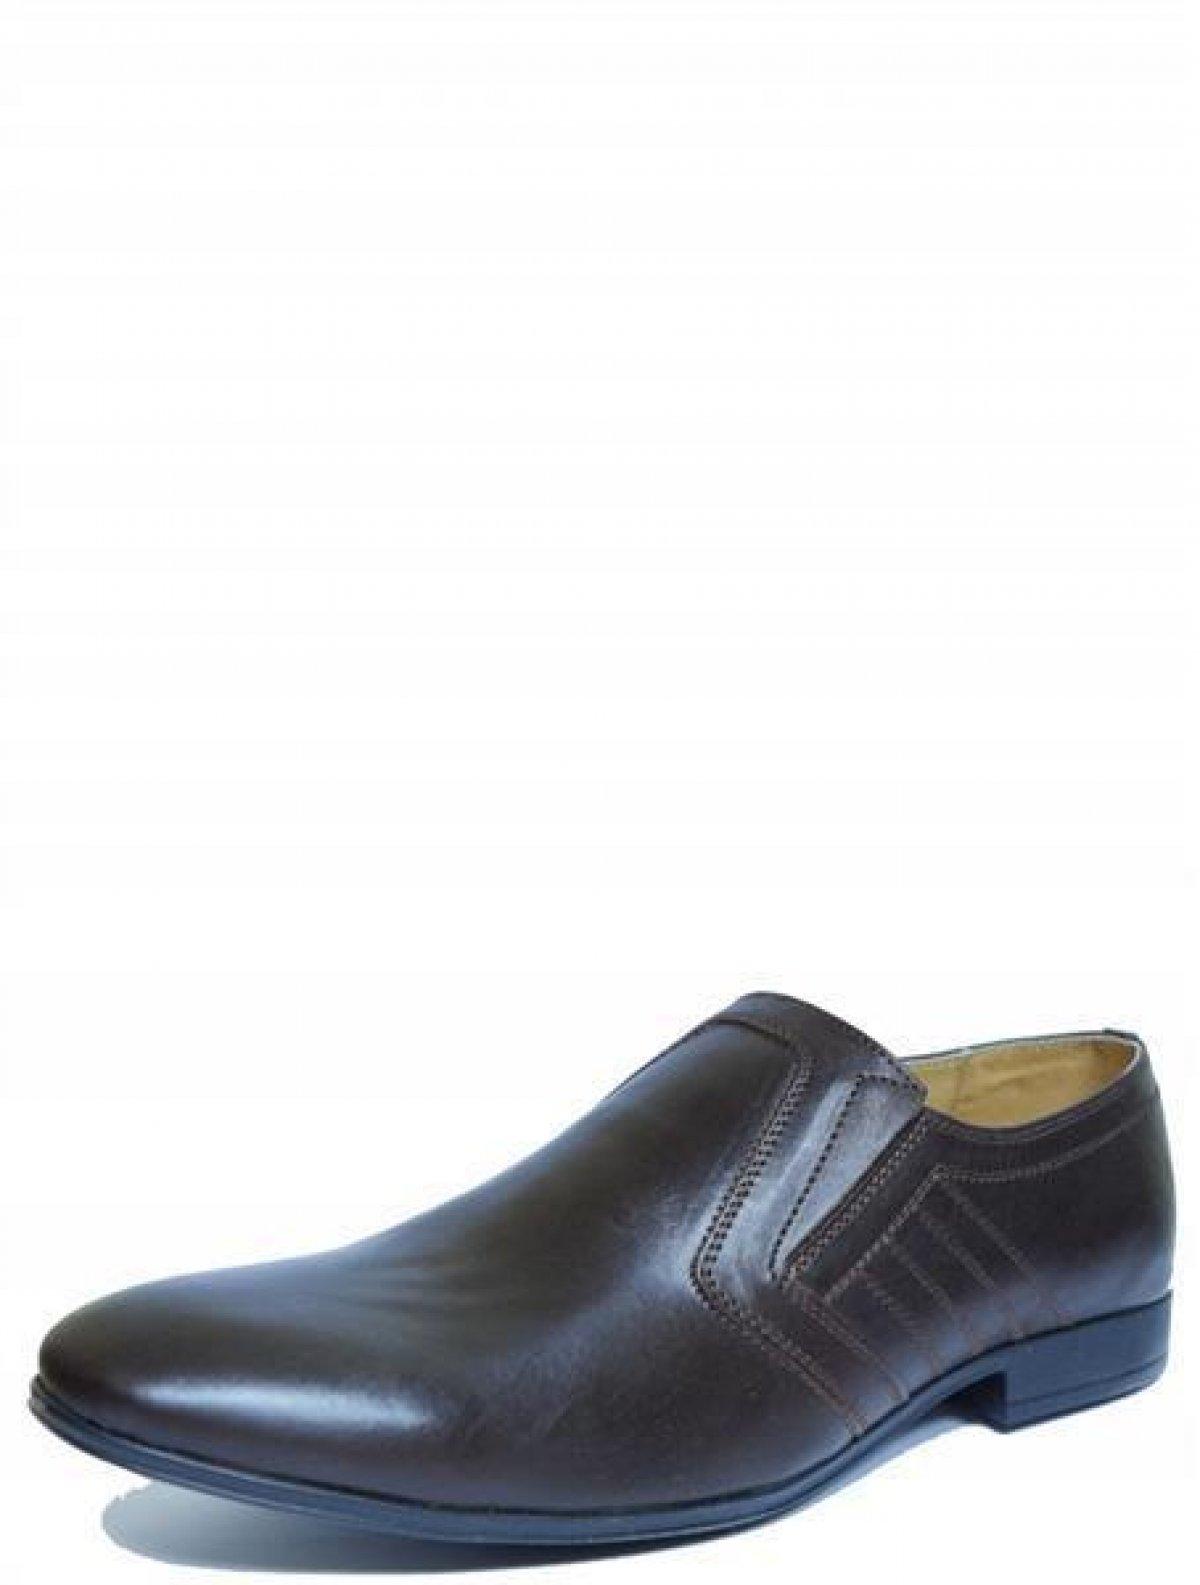 RU8460/V356 мужские туфли